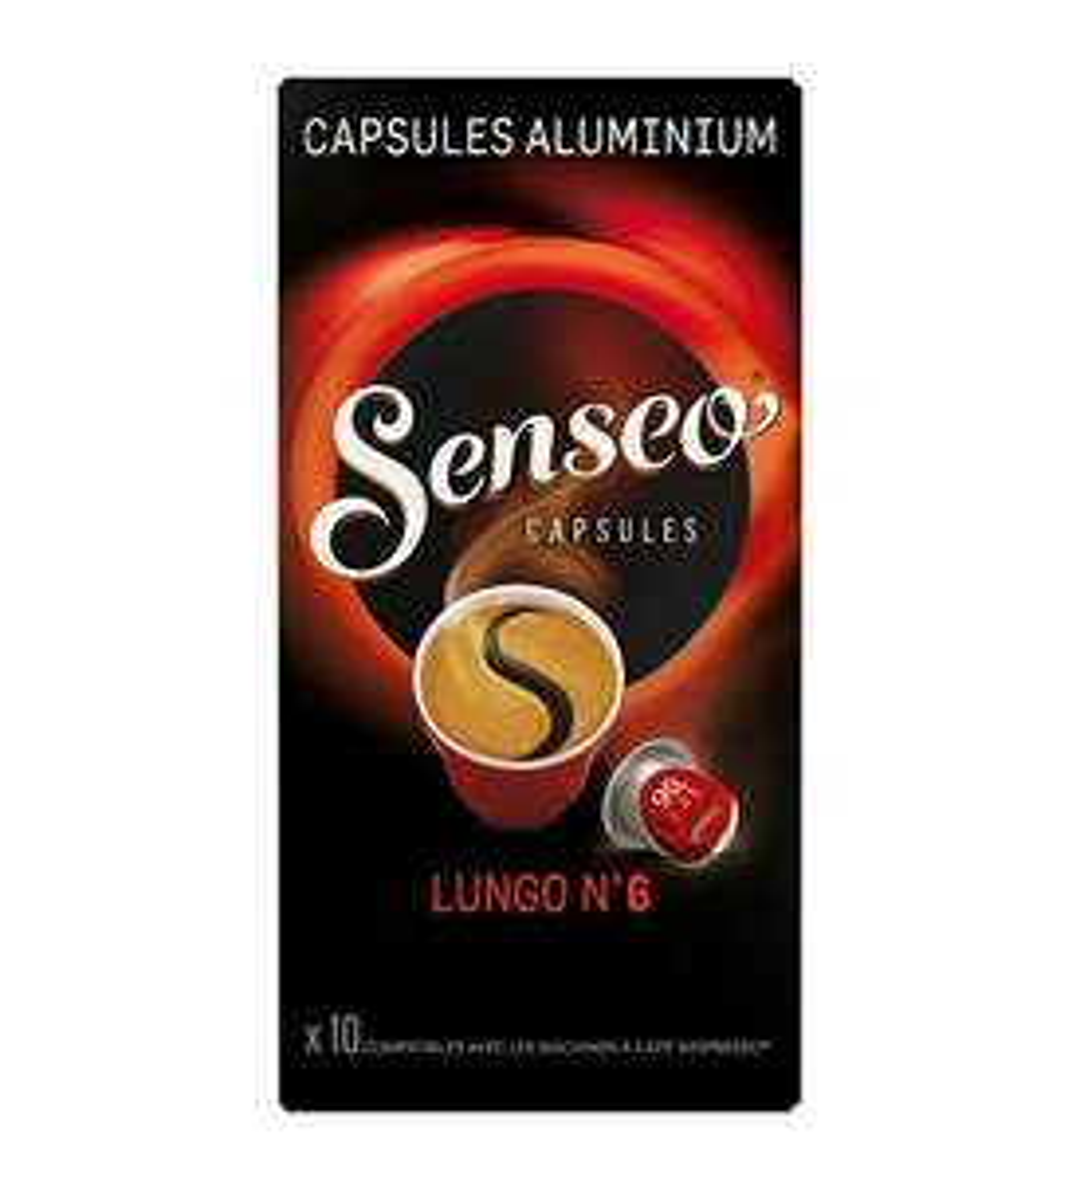 Lot de 20 paquets de 10 capsules compatibles Nespresso Senséo Espresso Lungo n°6 (200 capsules)